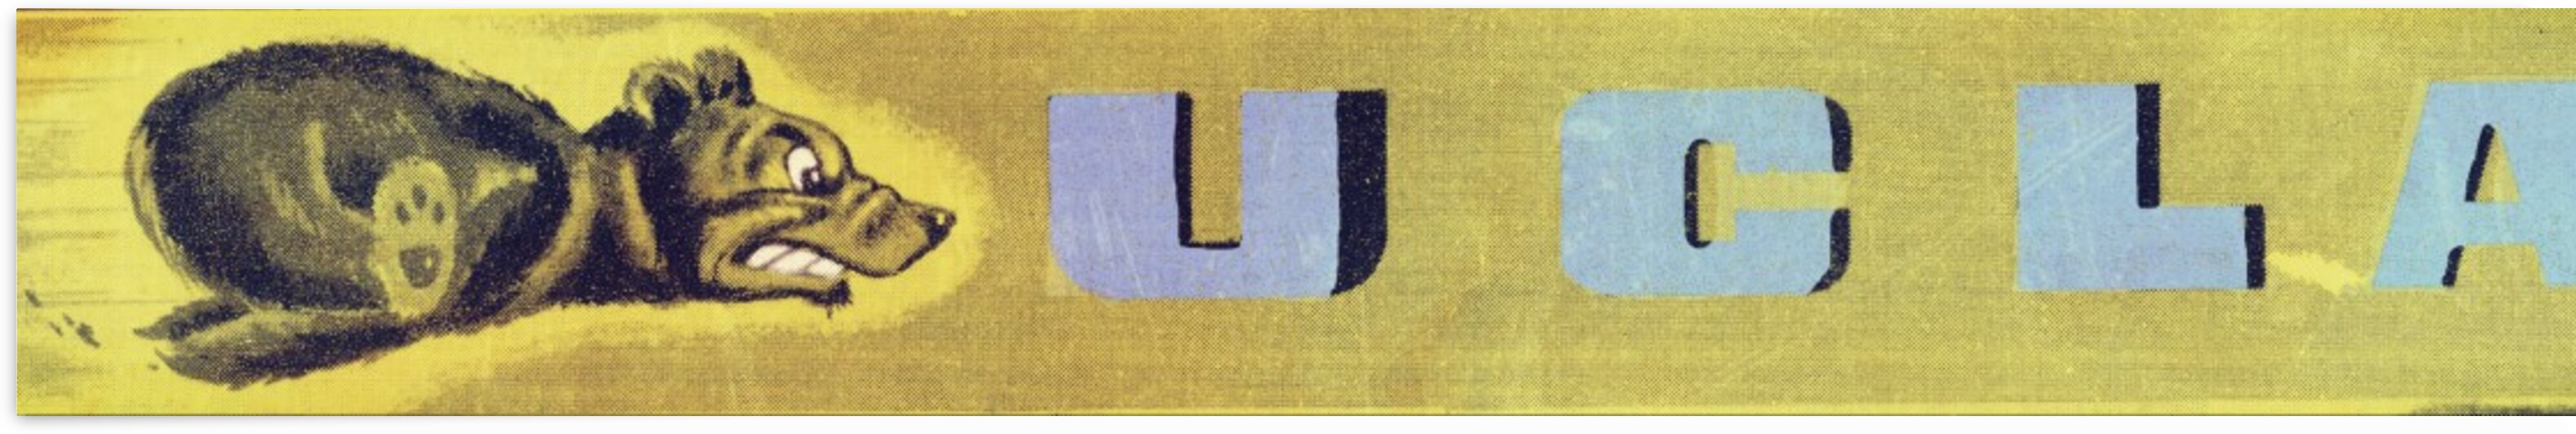 1948 ucla bruins art print by Row One Brand